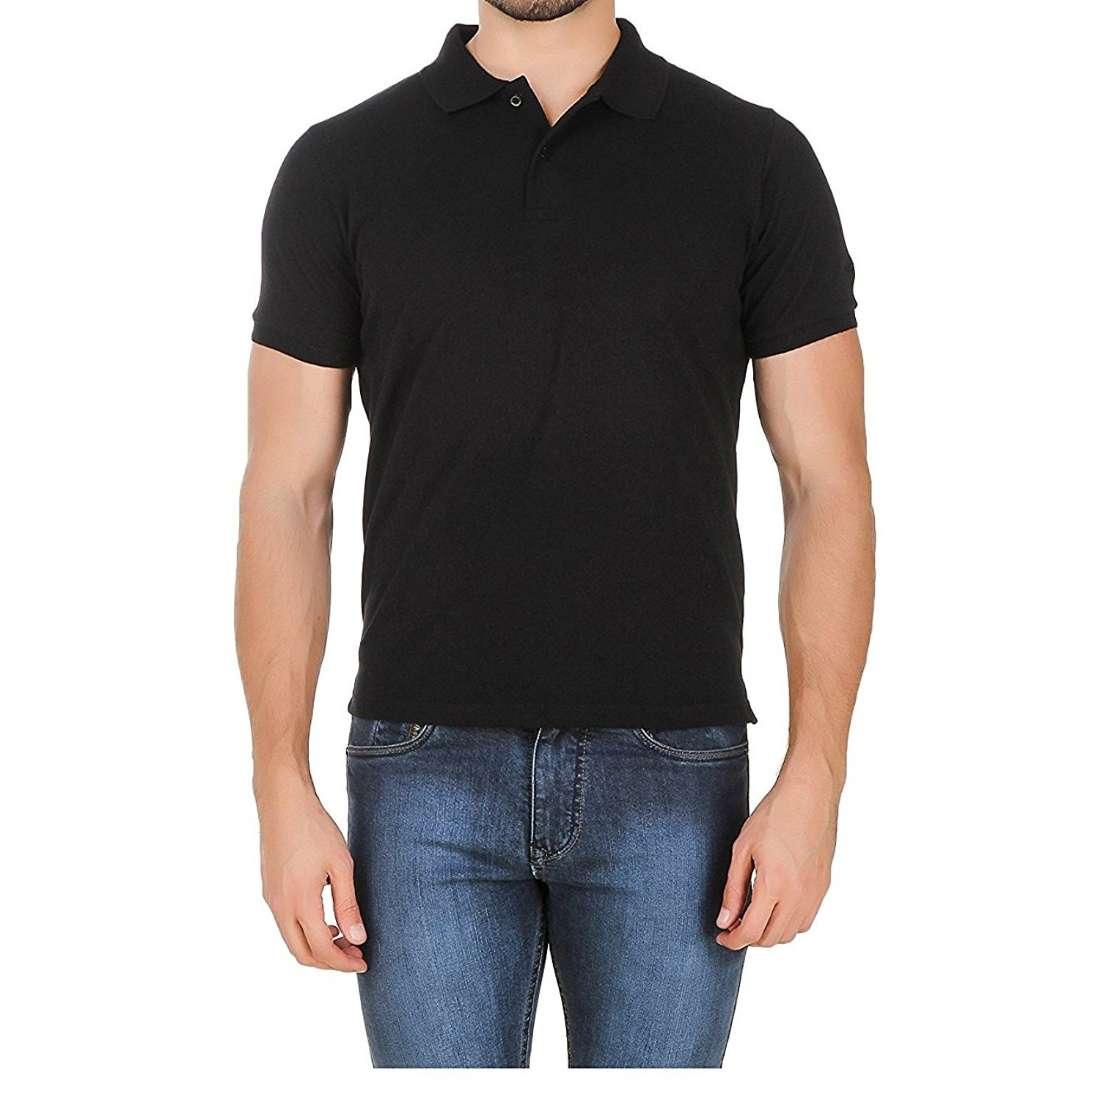 Lotto Men's Plain Regular Fit T-Shirt